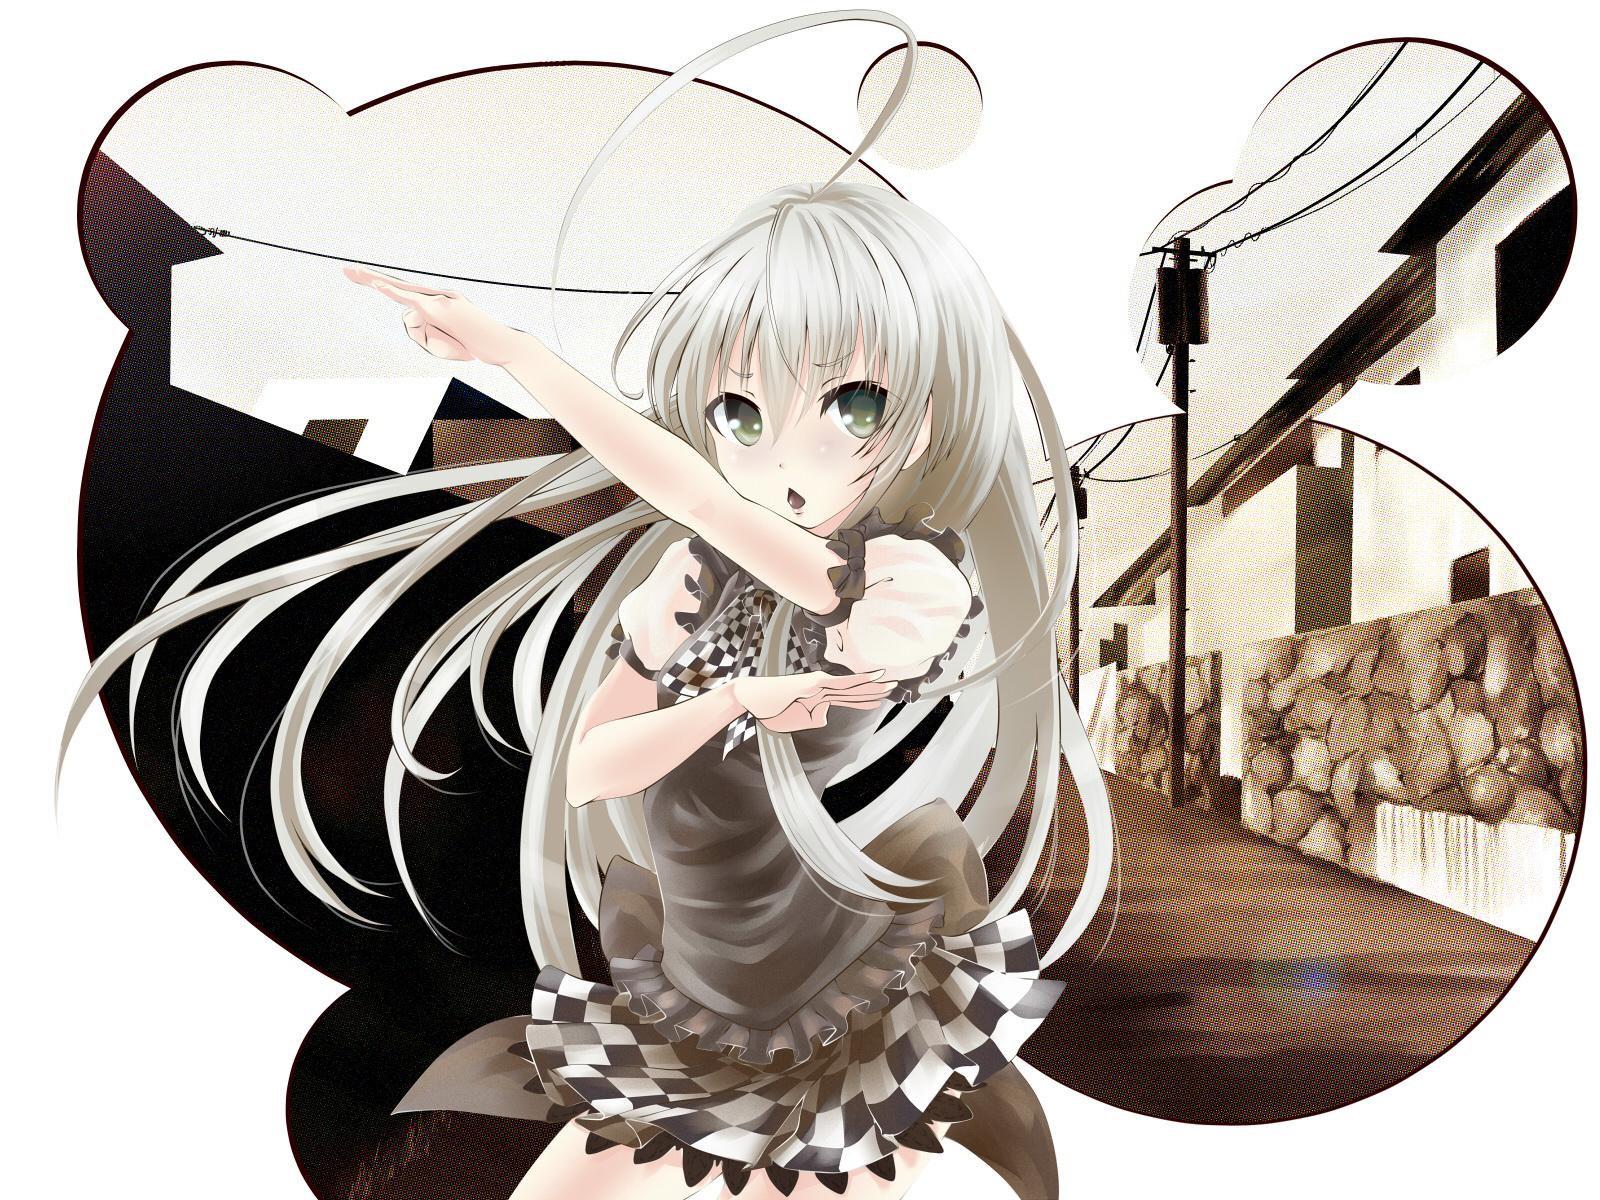 Wallpaper Nyaruko Crawling With Love Girls Anime